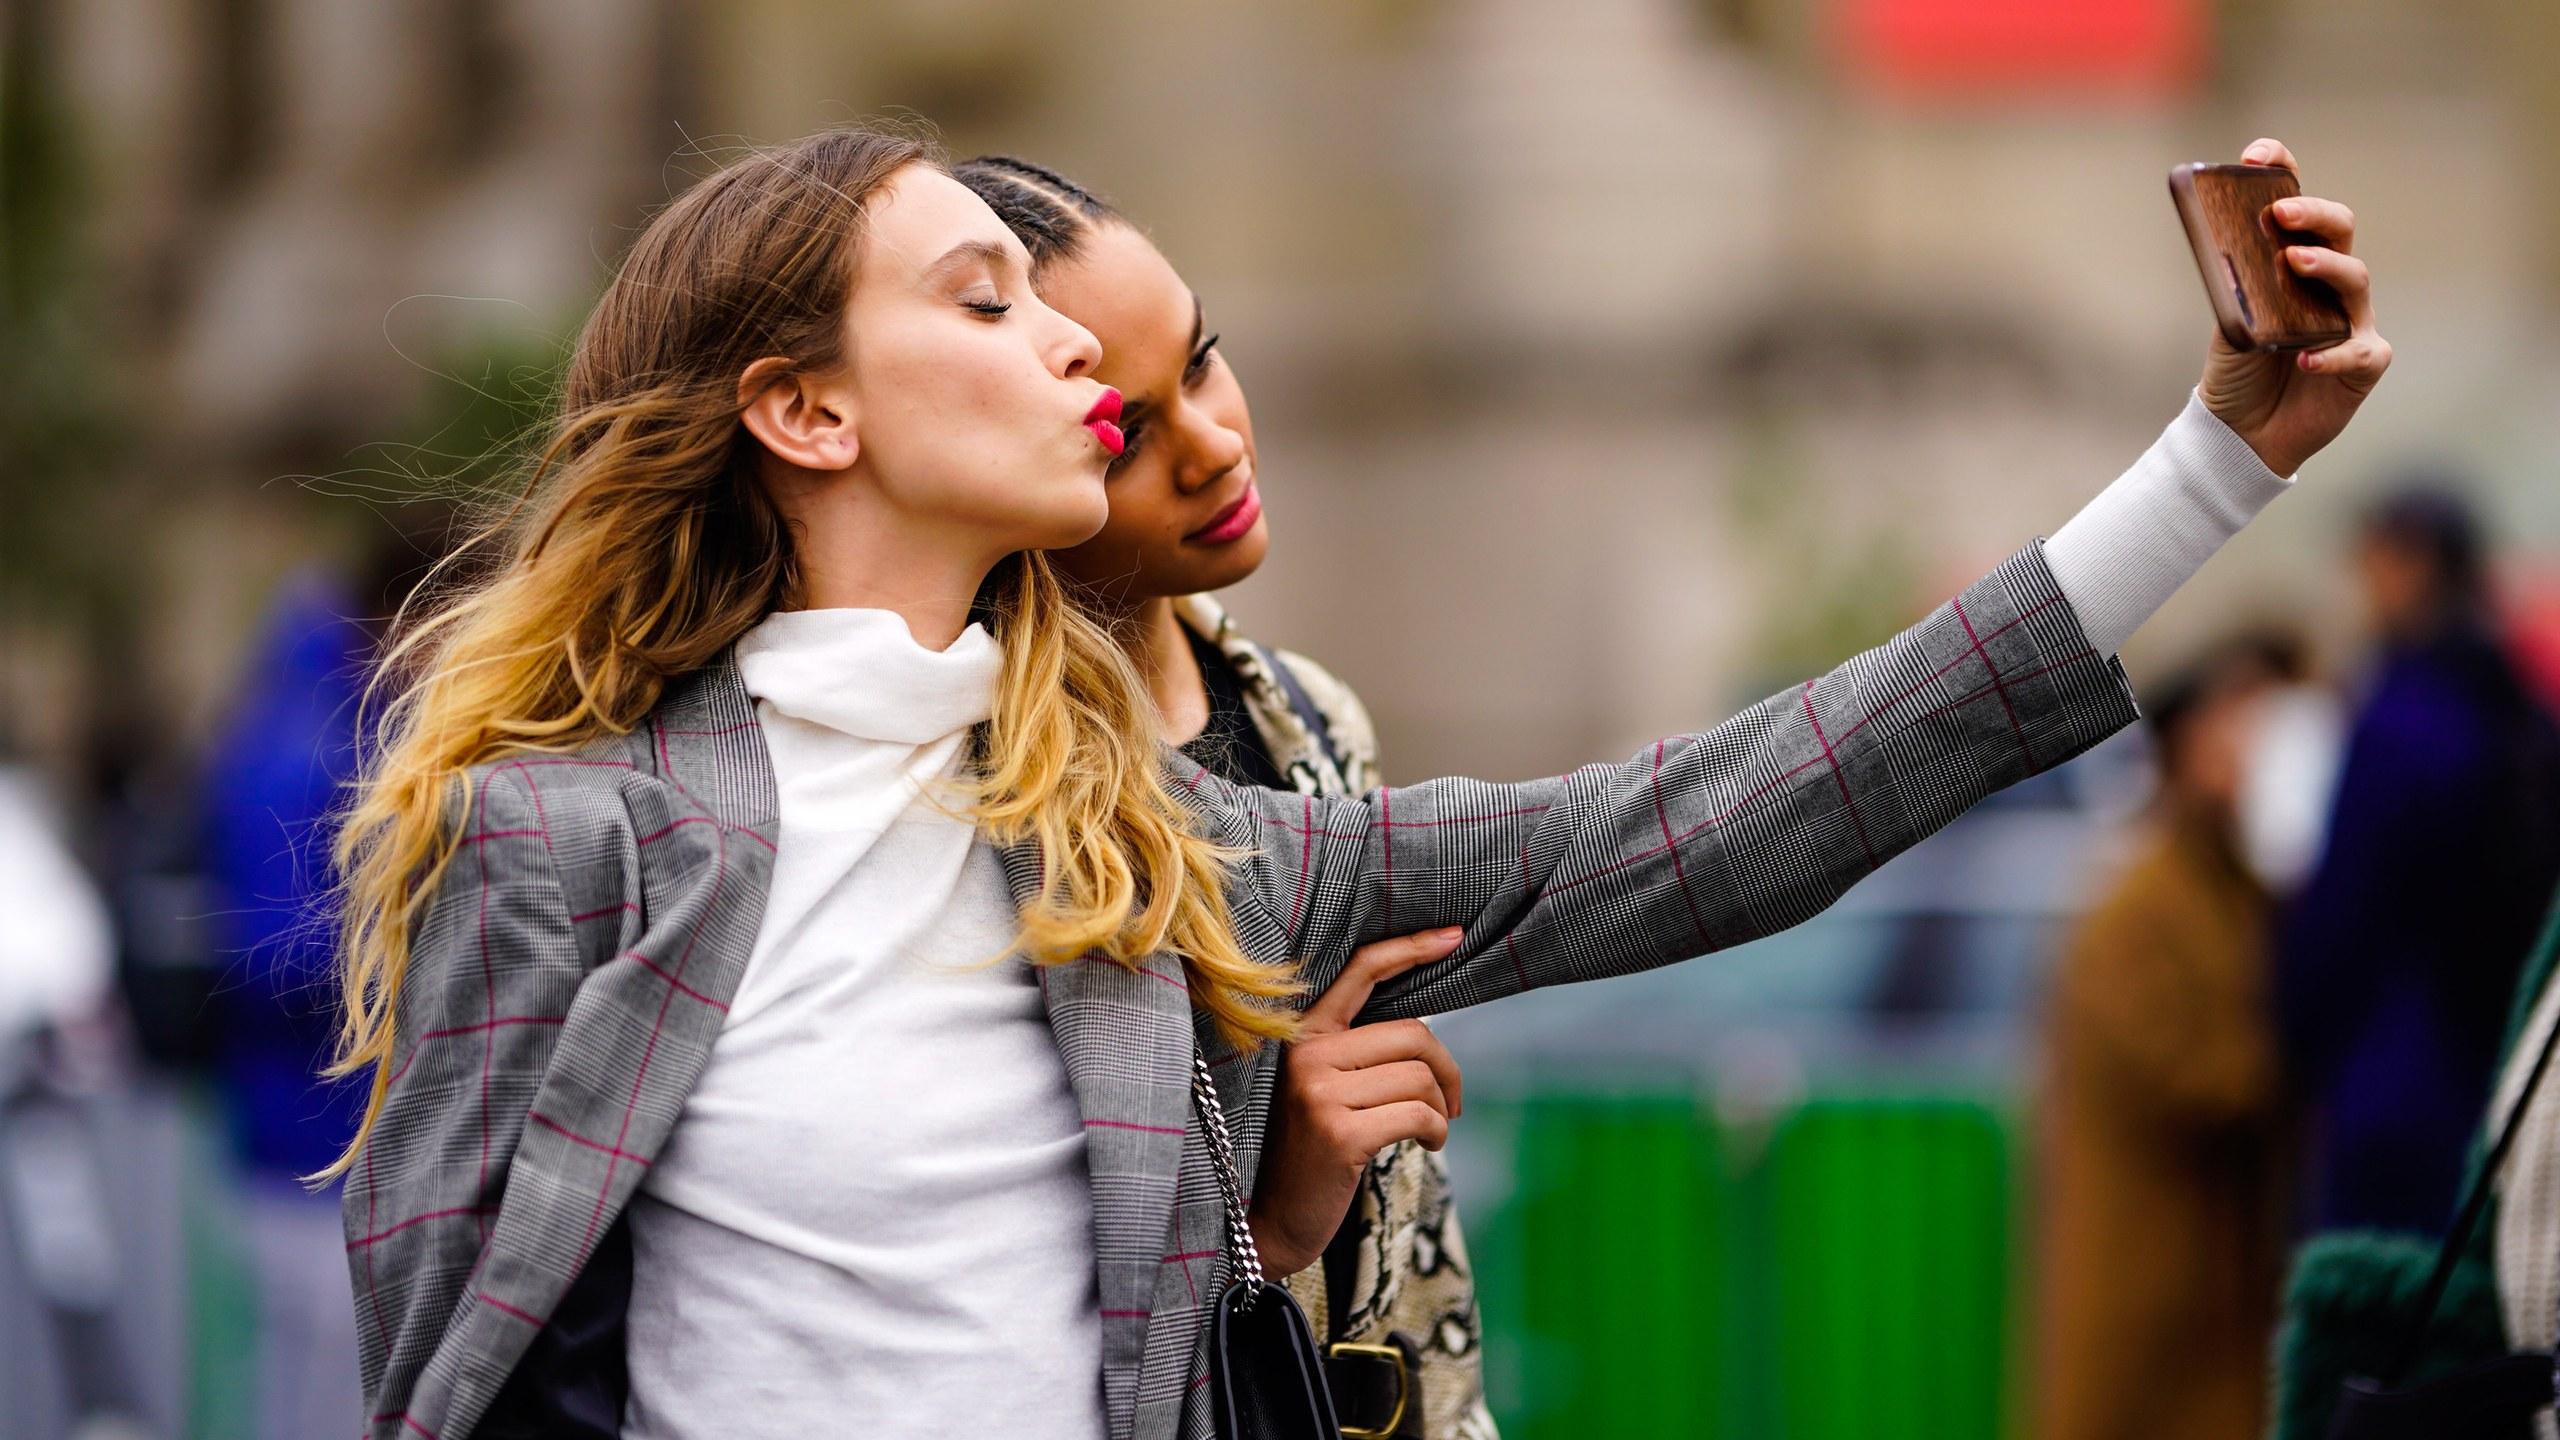 Social influencer selfie